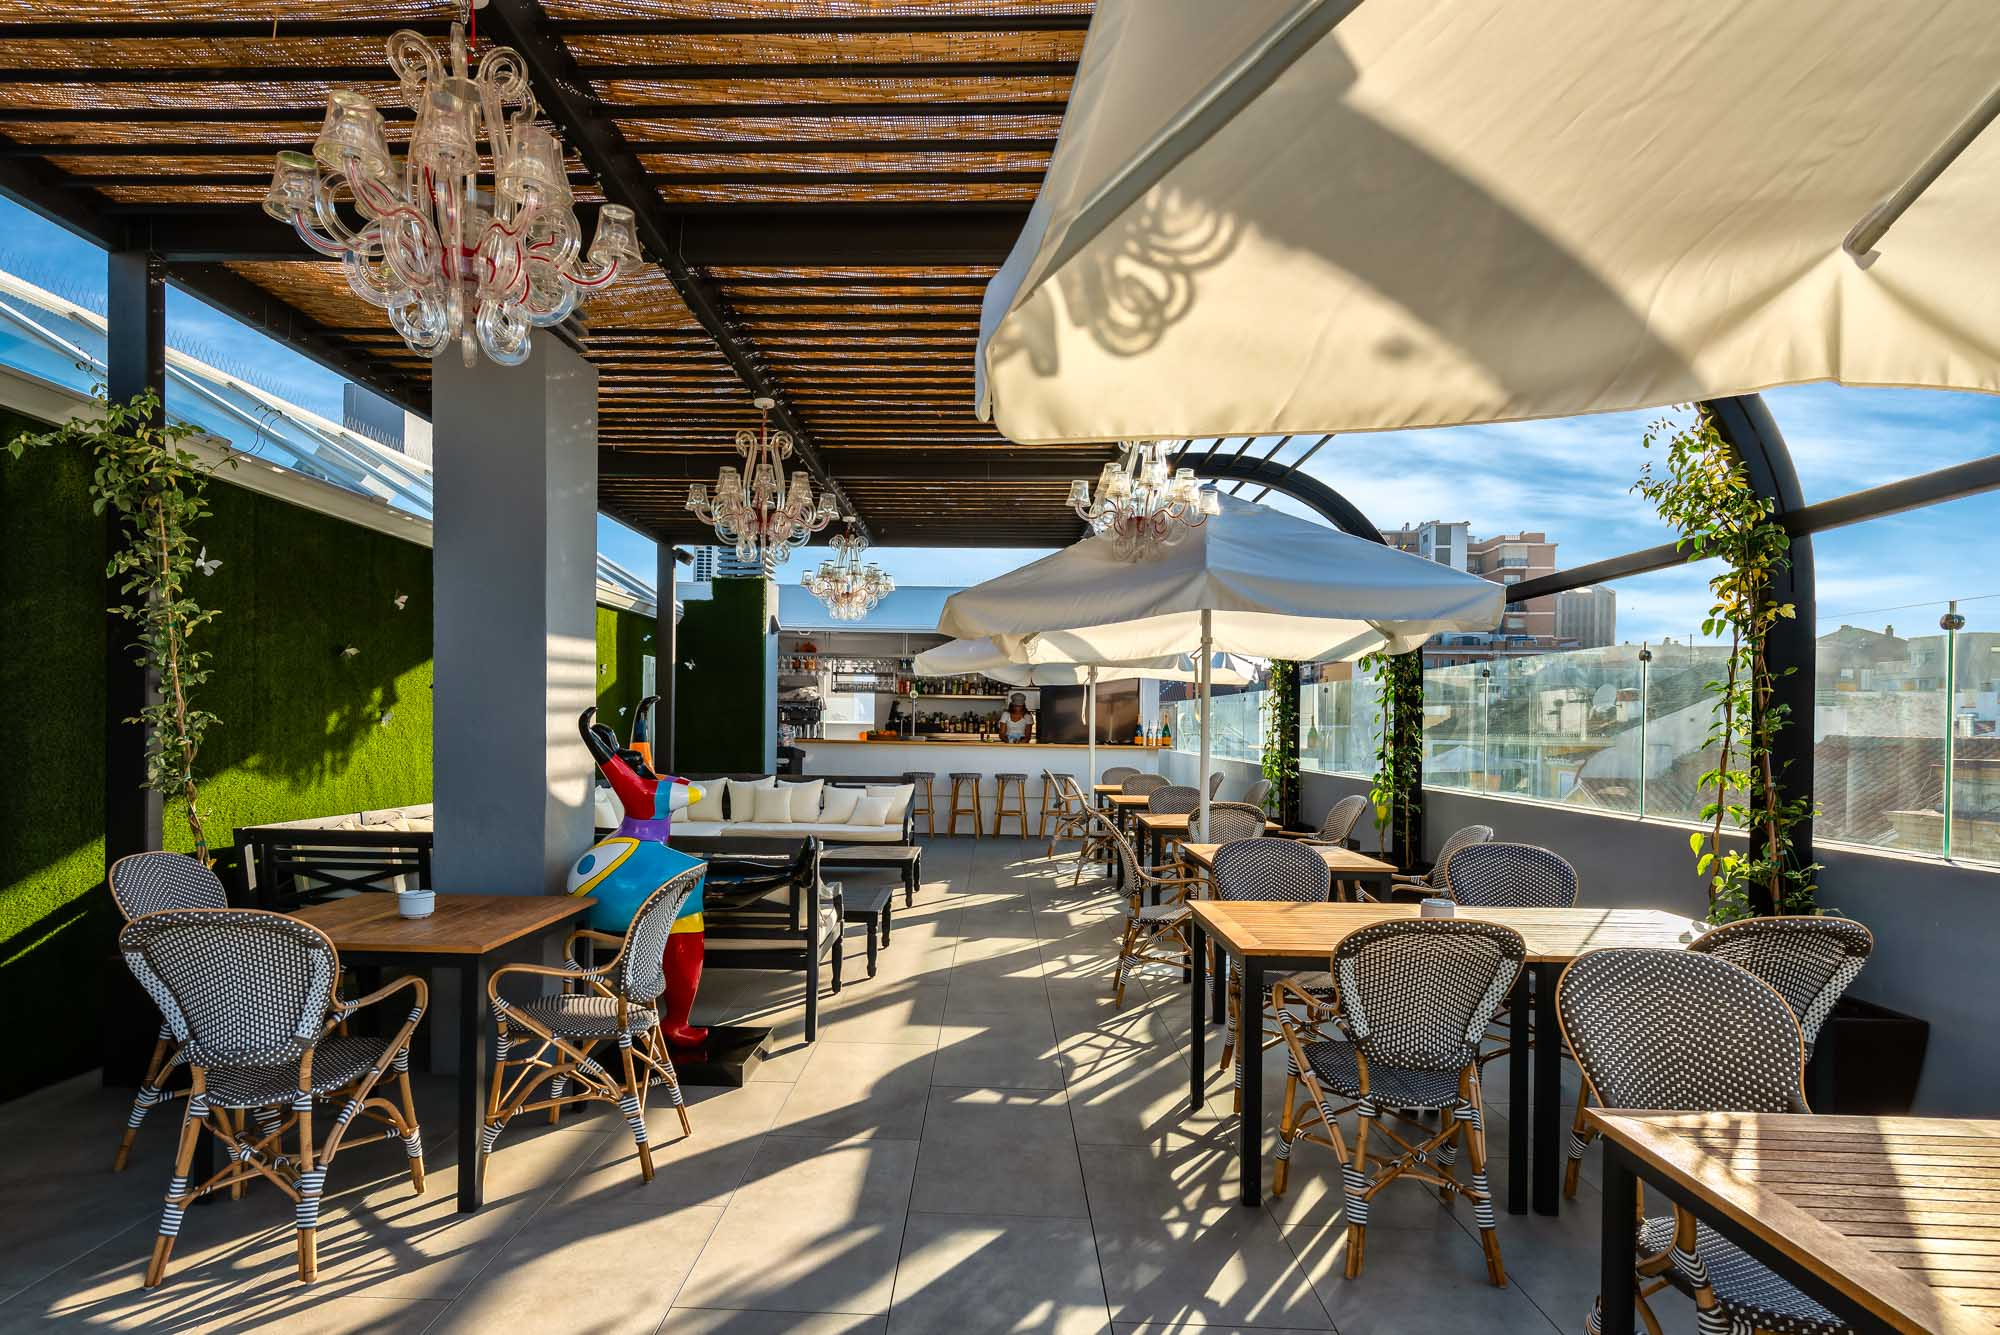 Mariposa Hotel, Malaga, Spain